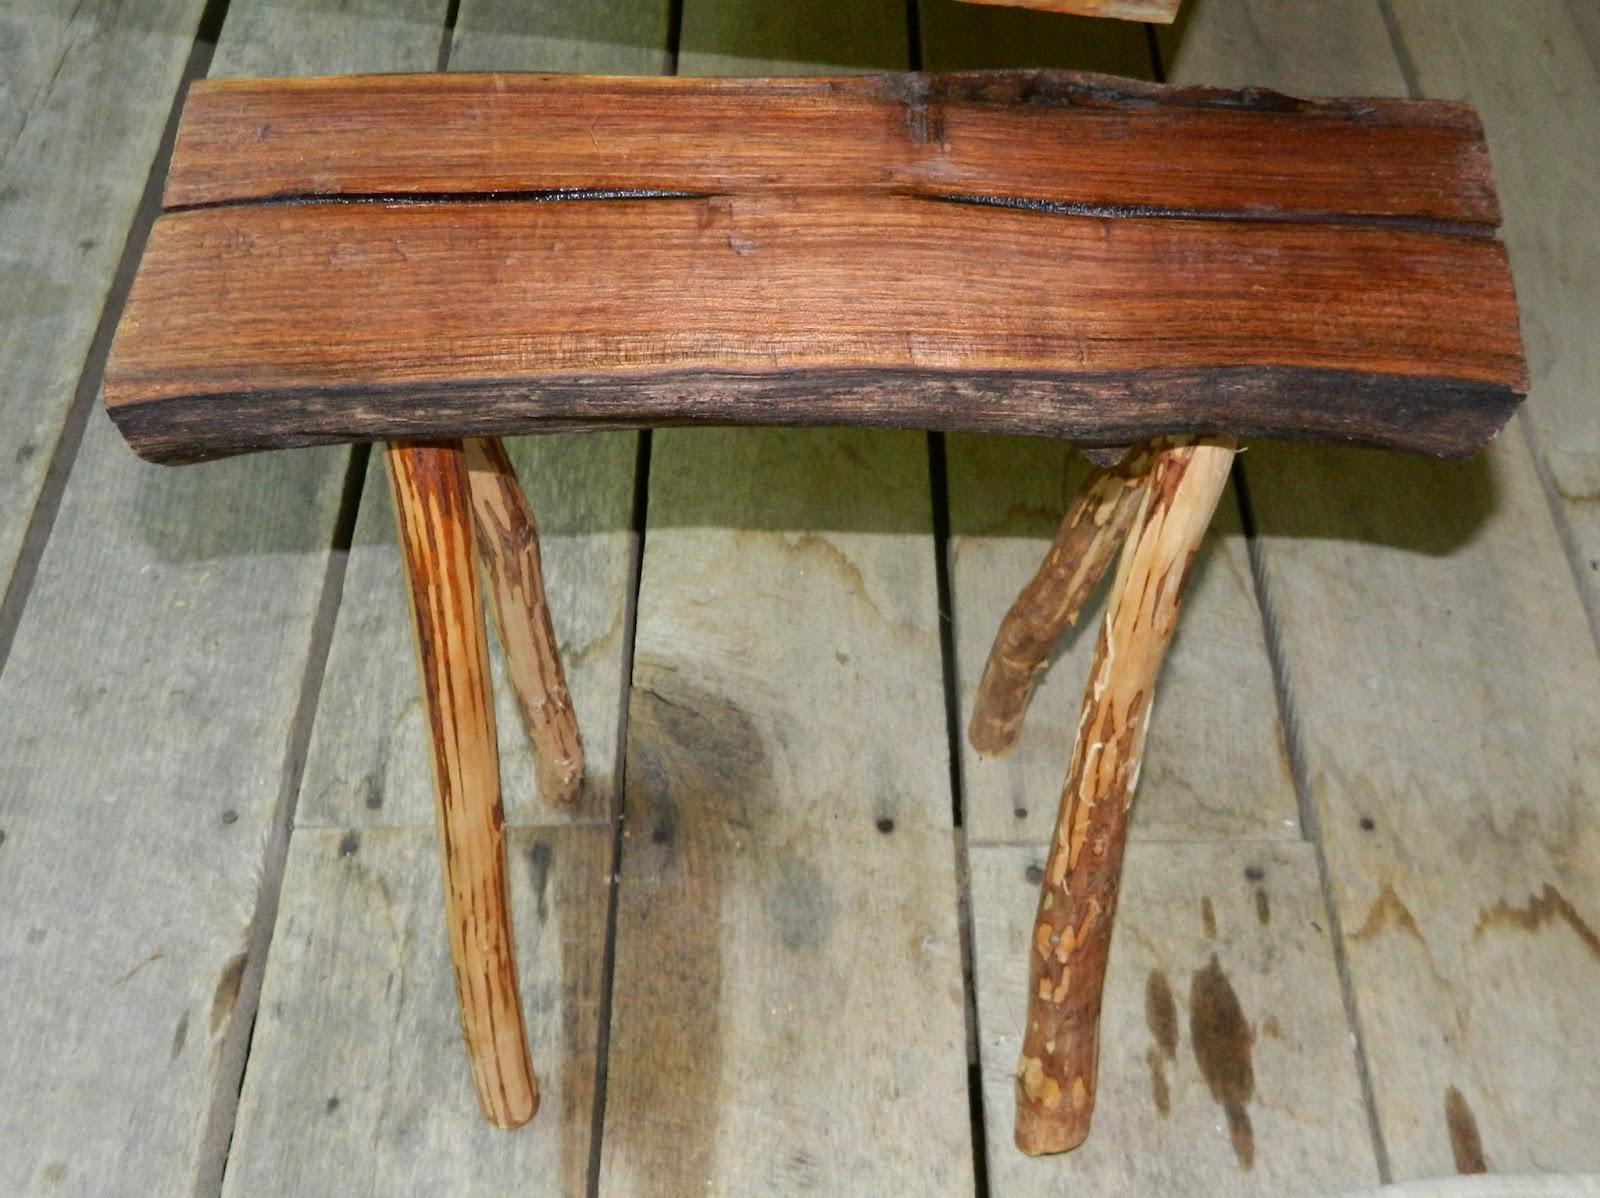 Lise's Log Cabin Life: Building A Primitive Table